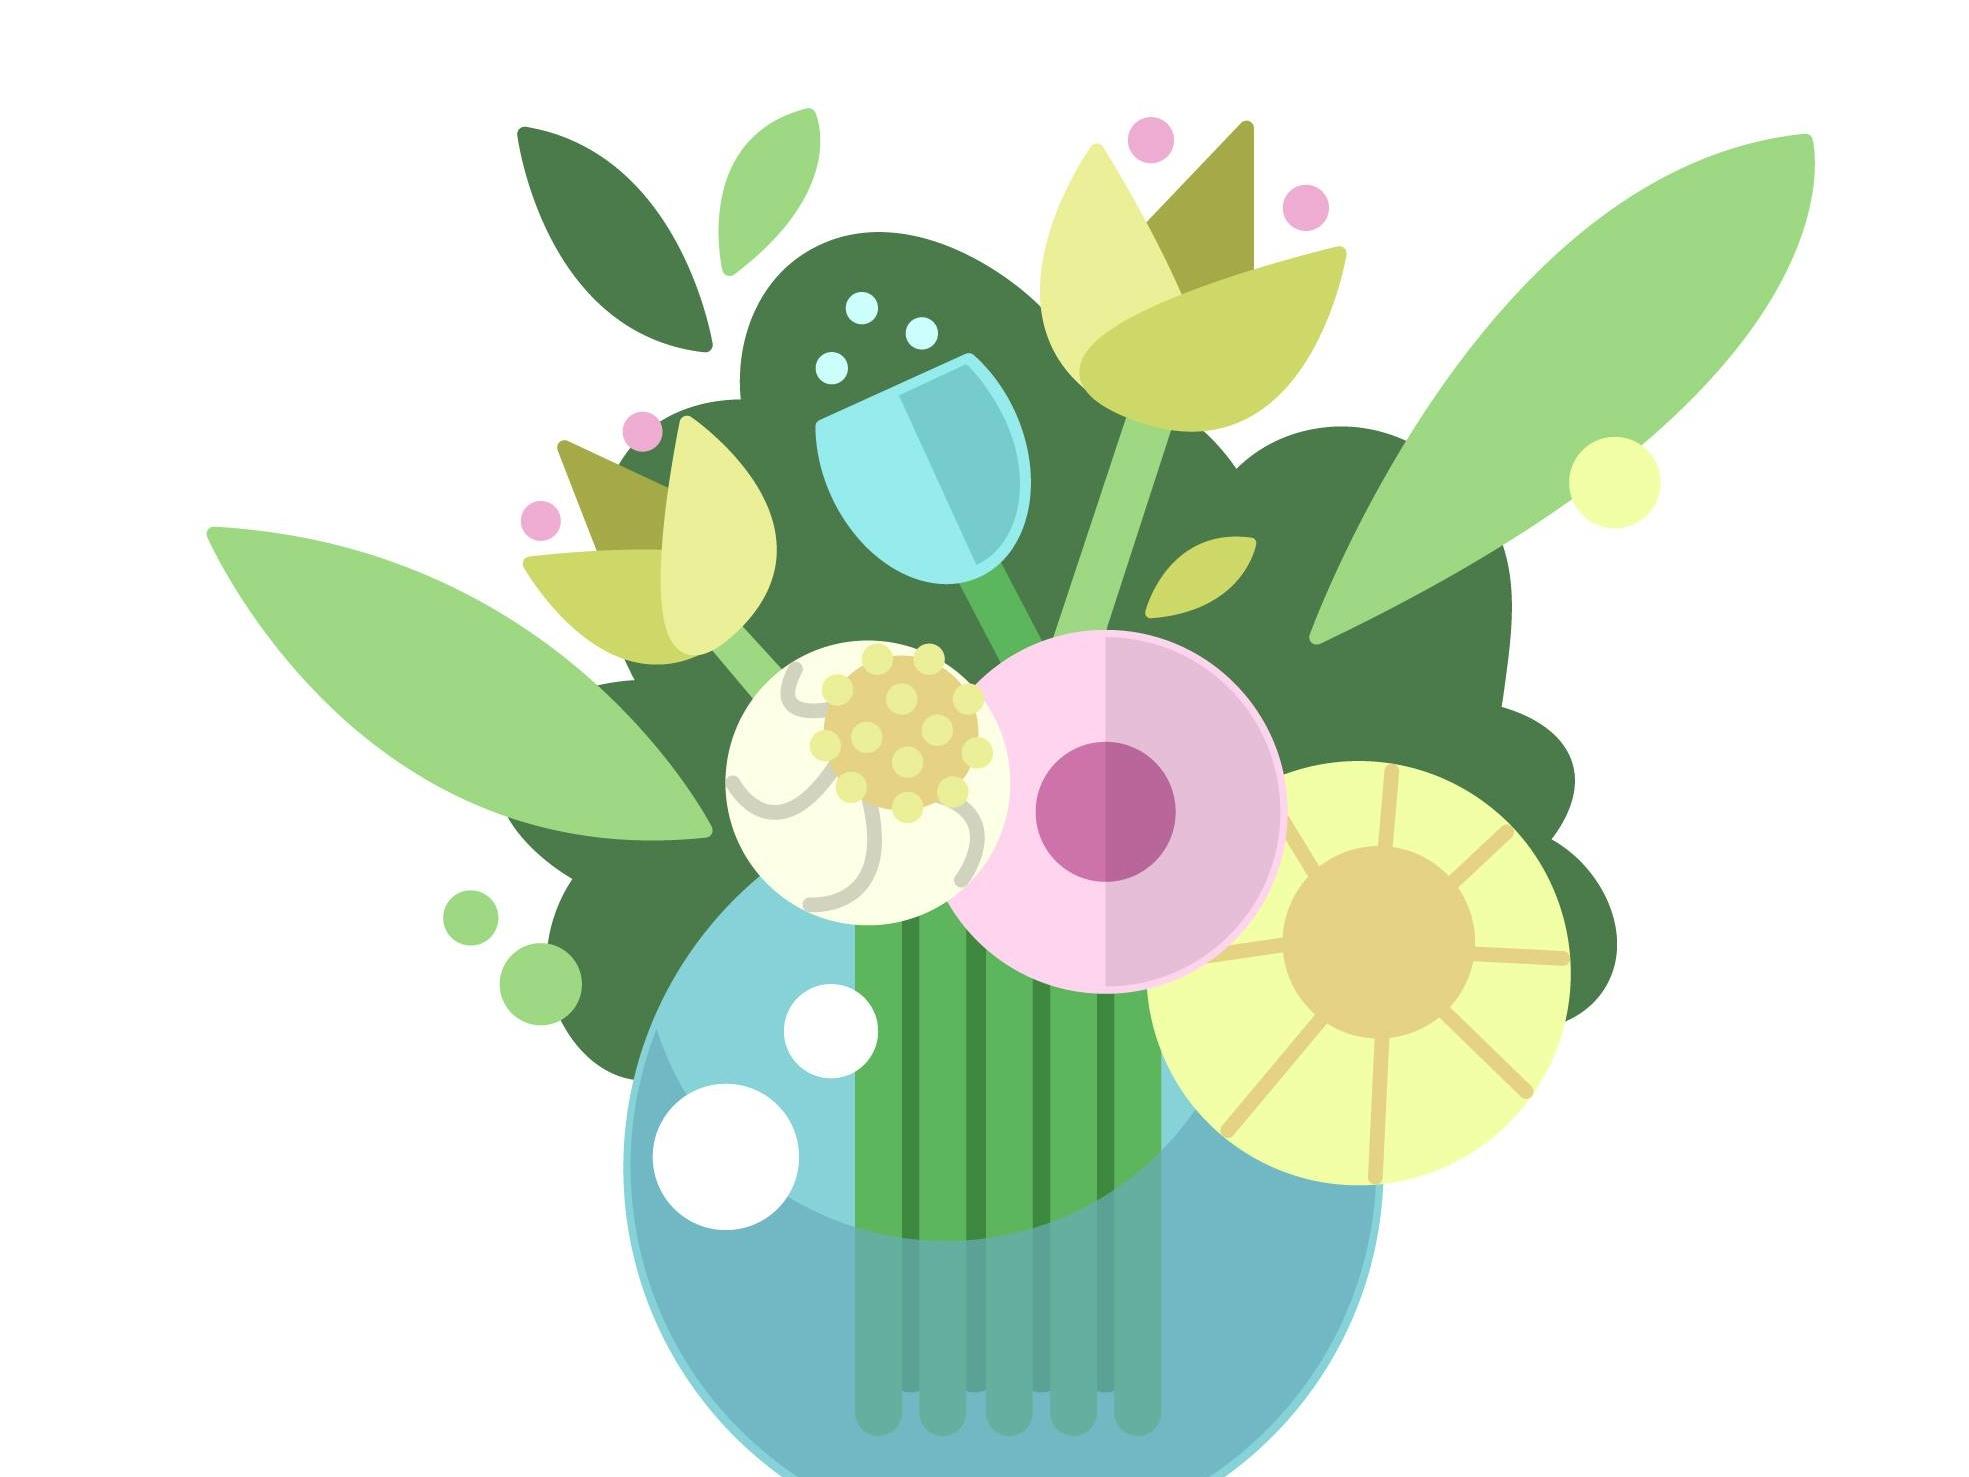 Fleur Illustration fleur illustrator illustrateur plantes vectofanny giacomini